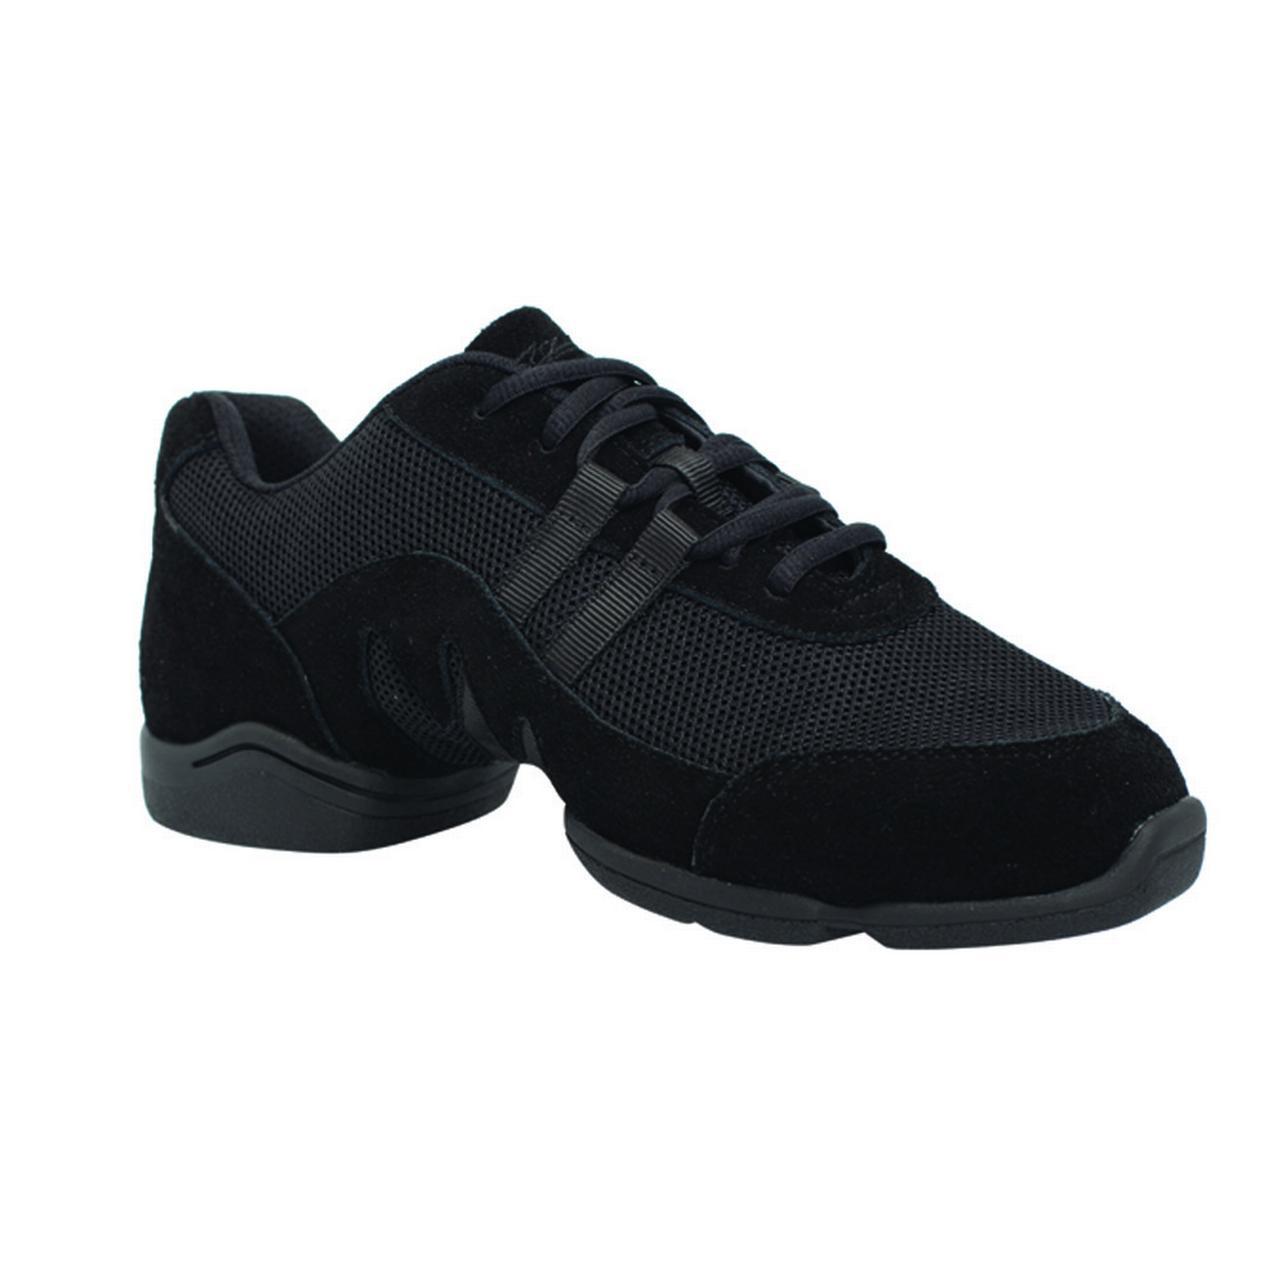 Sansha Adult Black Split Sole Mercury Low Top Sneakers Medium Womens